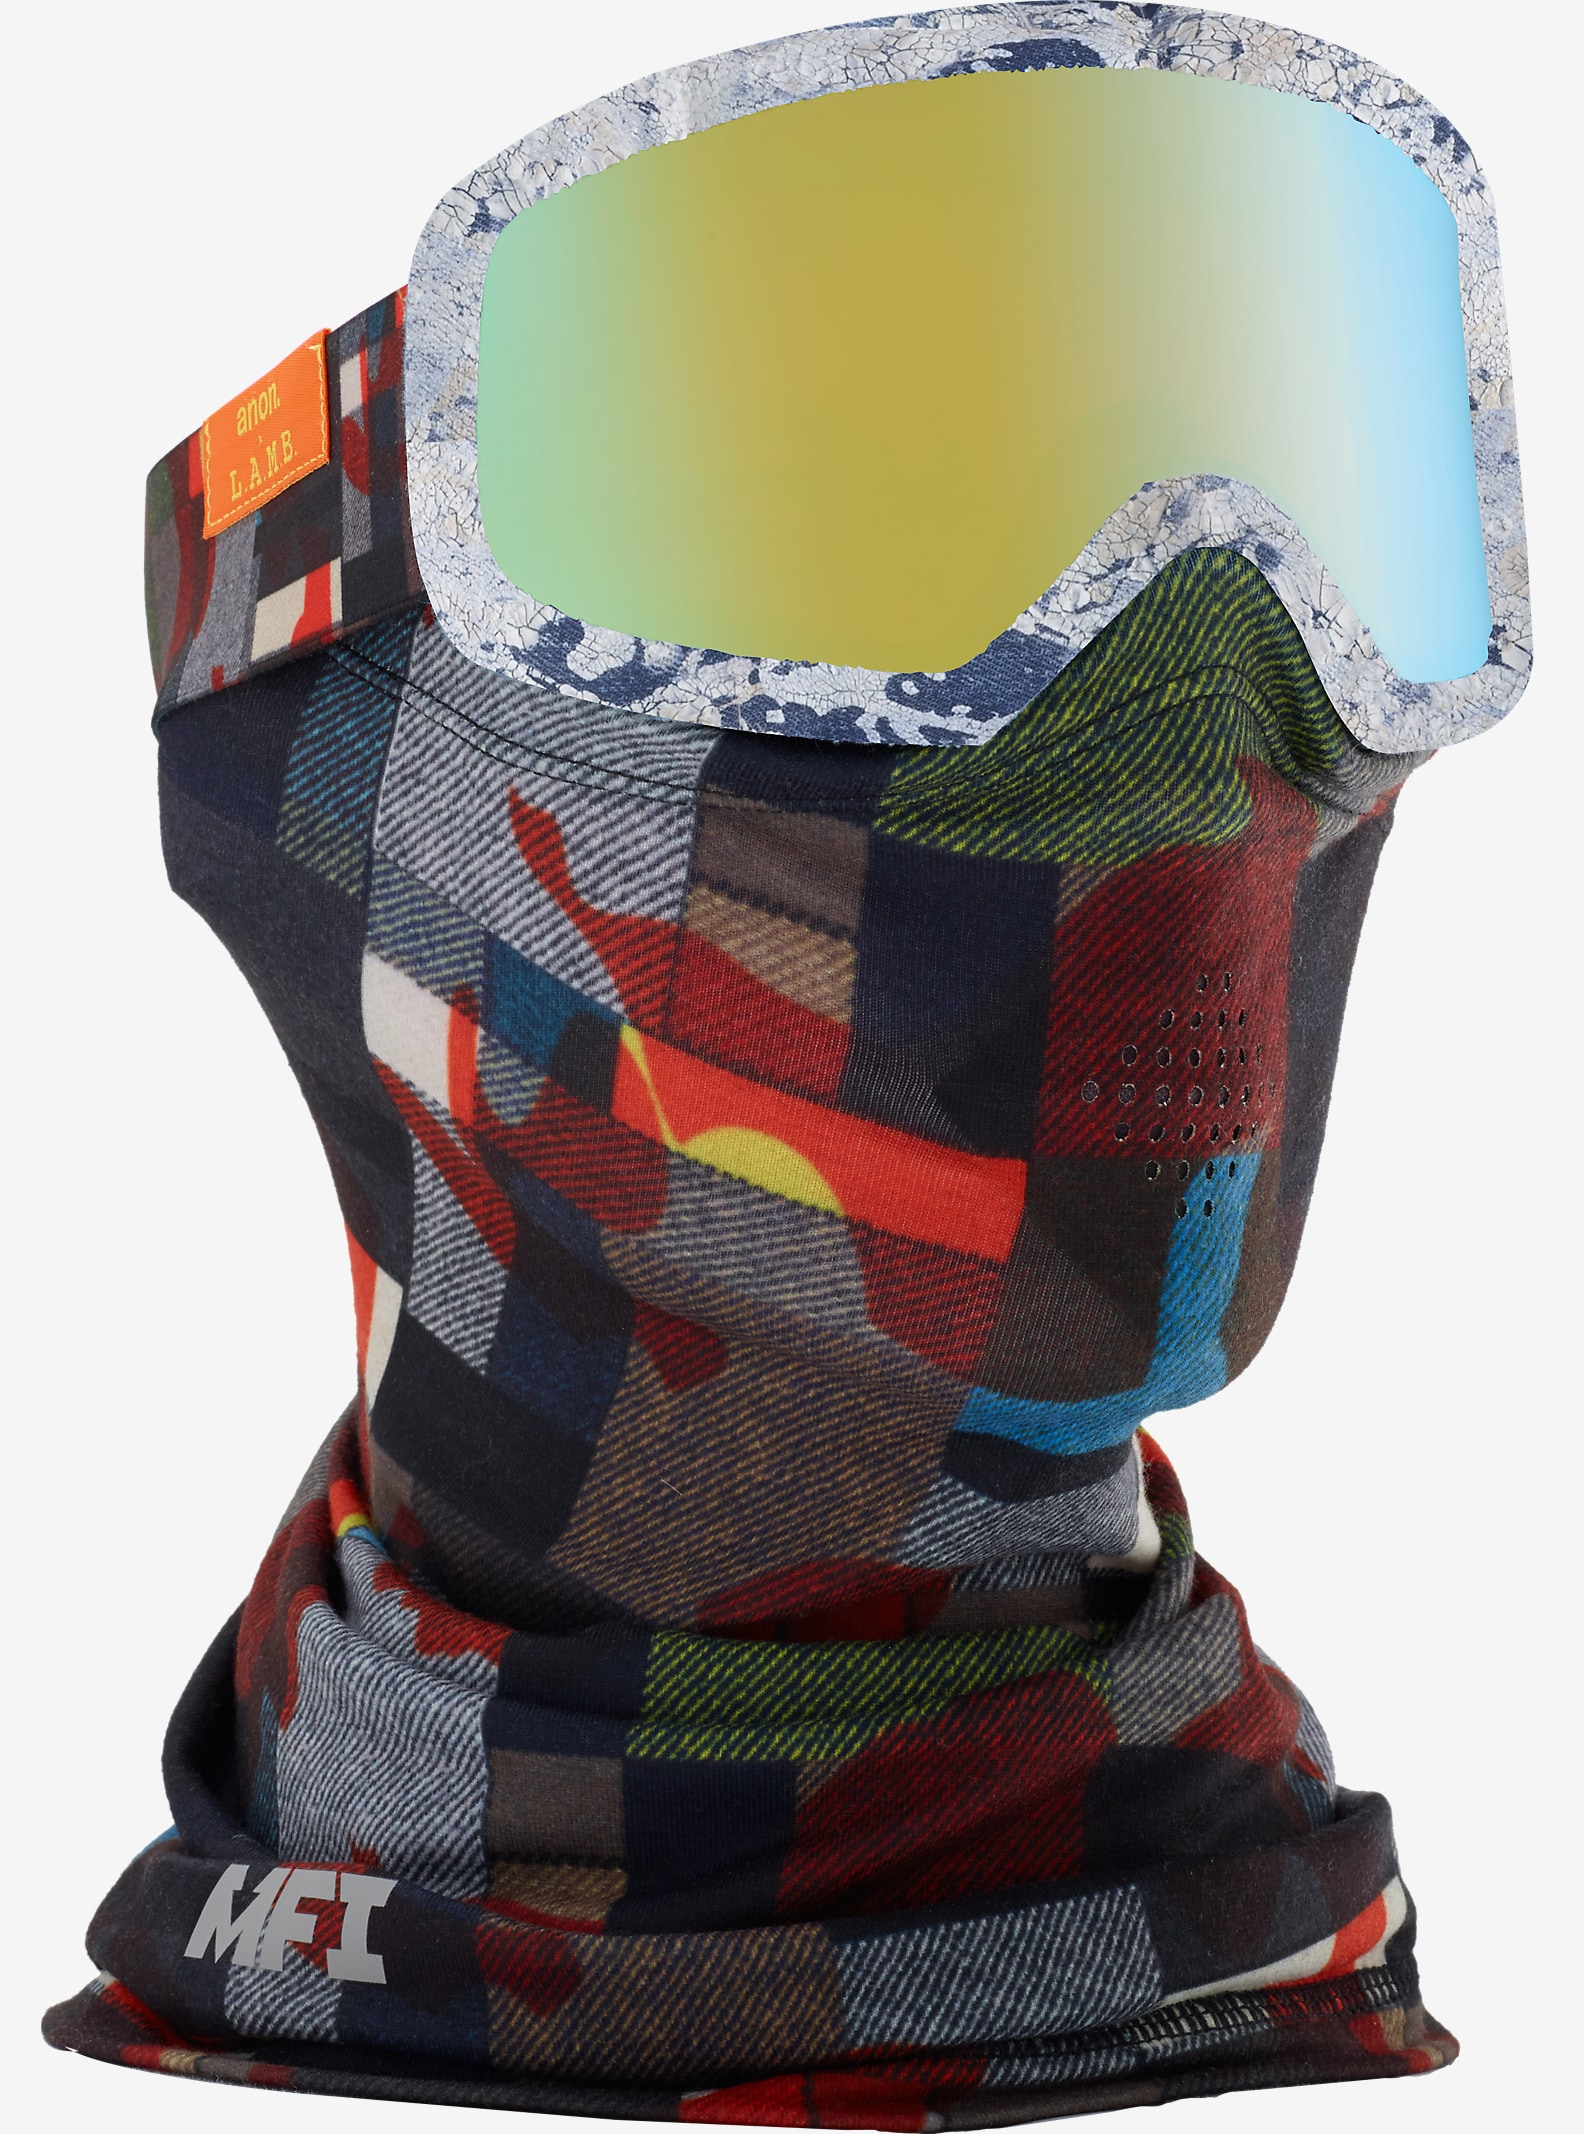 L.A.M.B. x anon. Deringer MFI Goggle shown in Frame: L.A.M.B, Lens: Gold Chrome